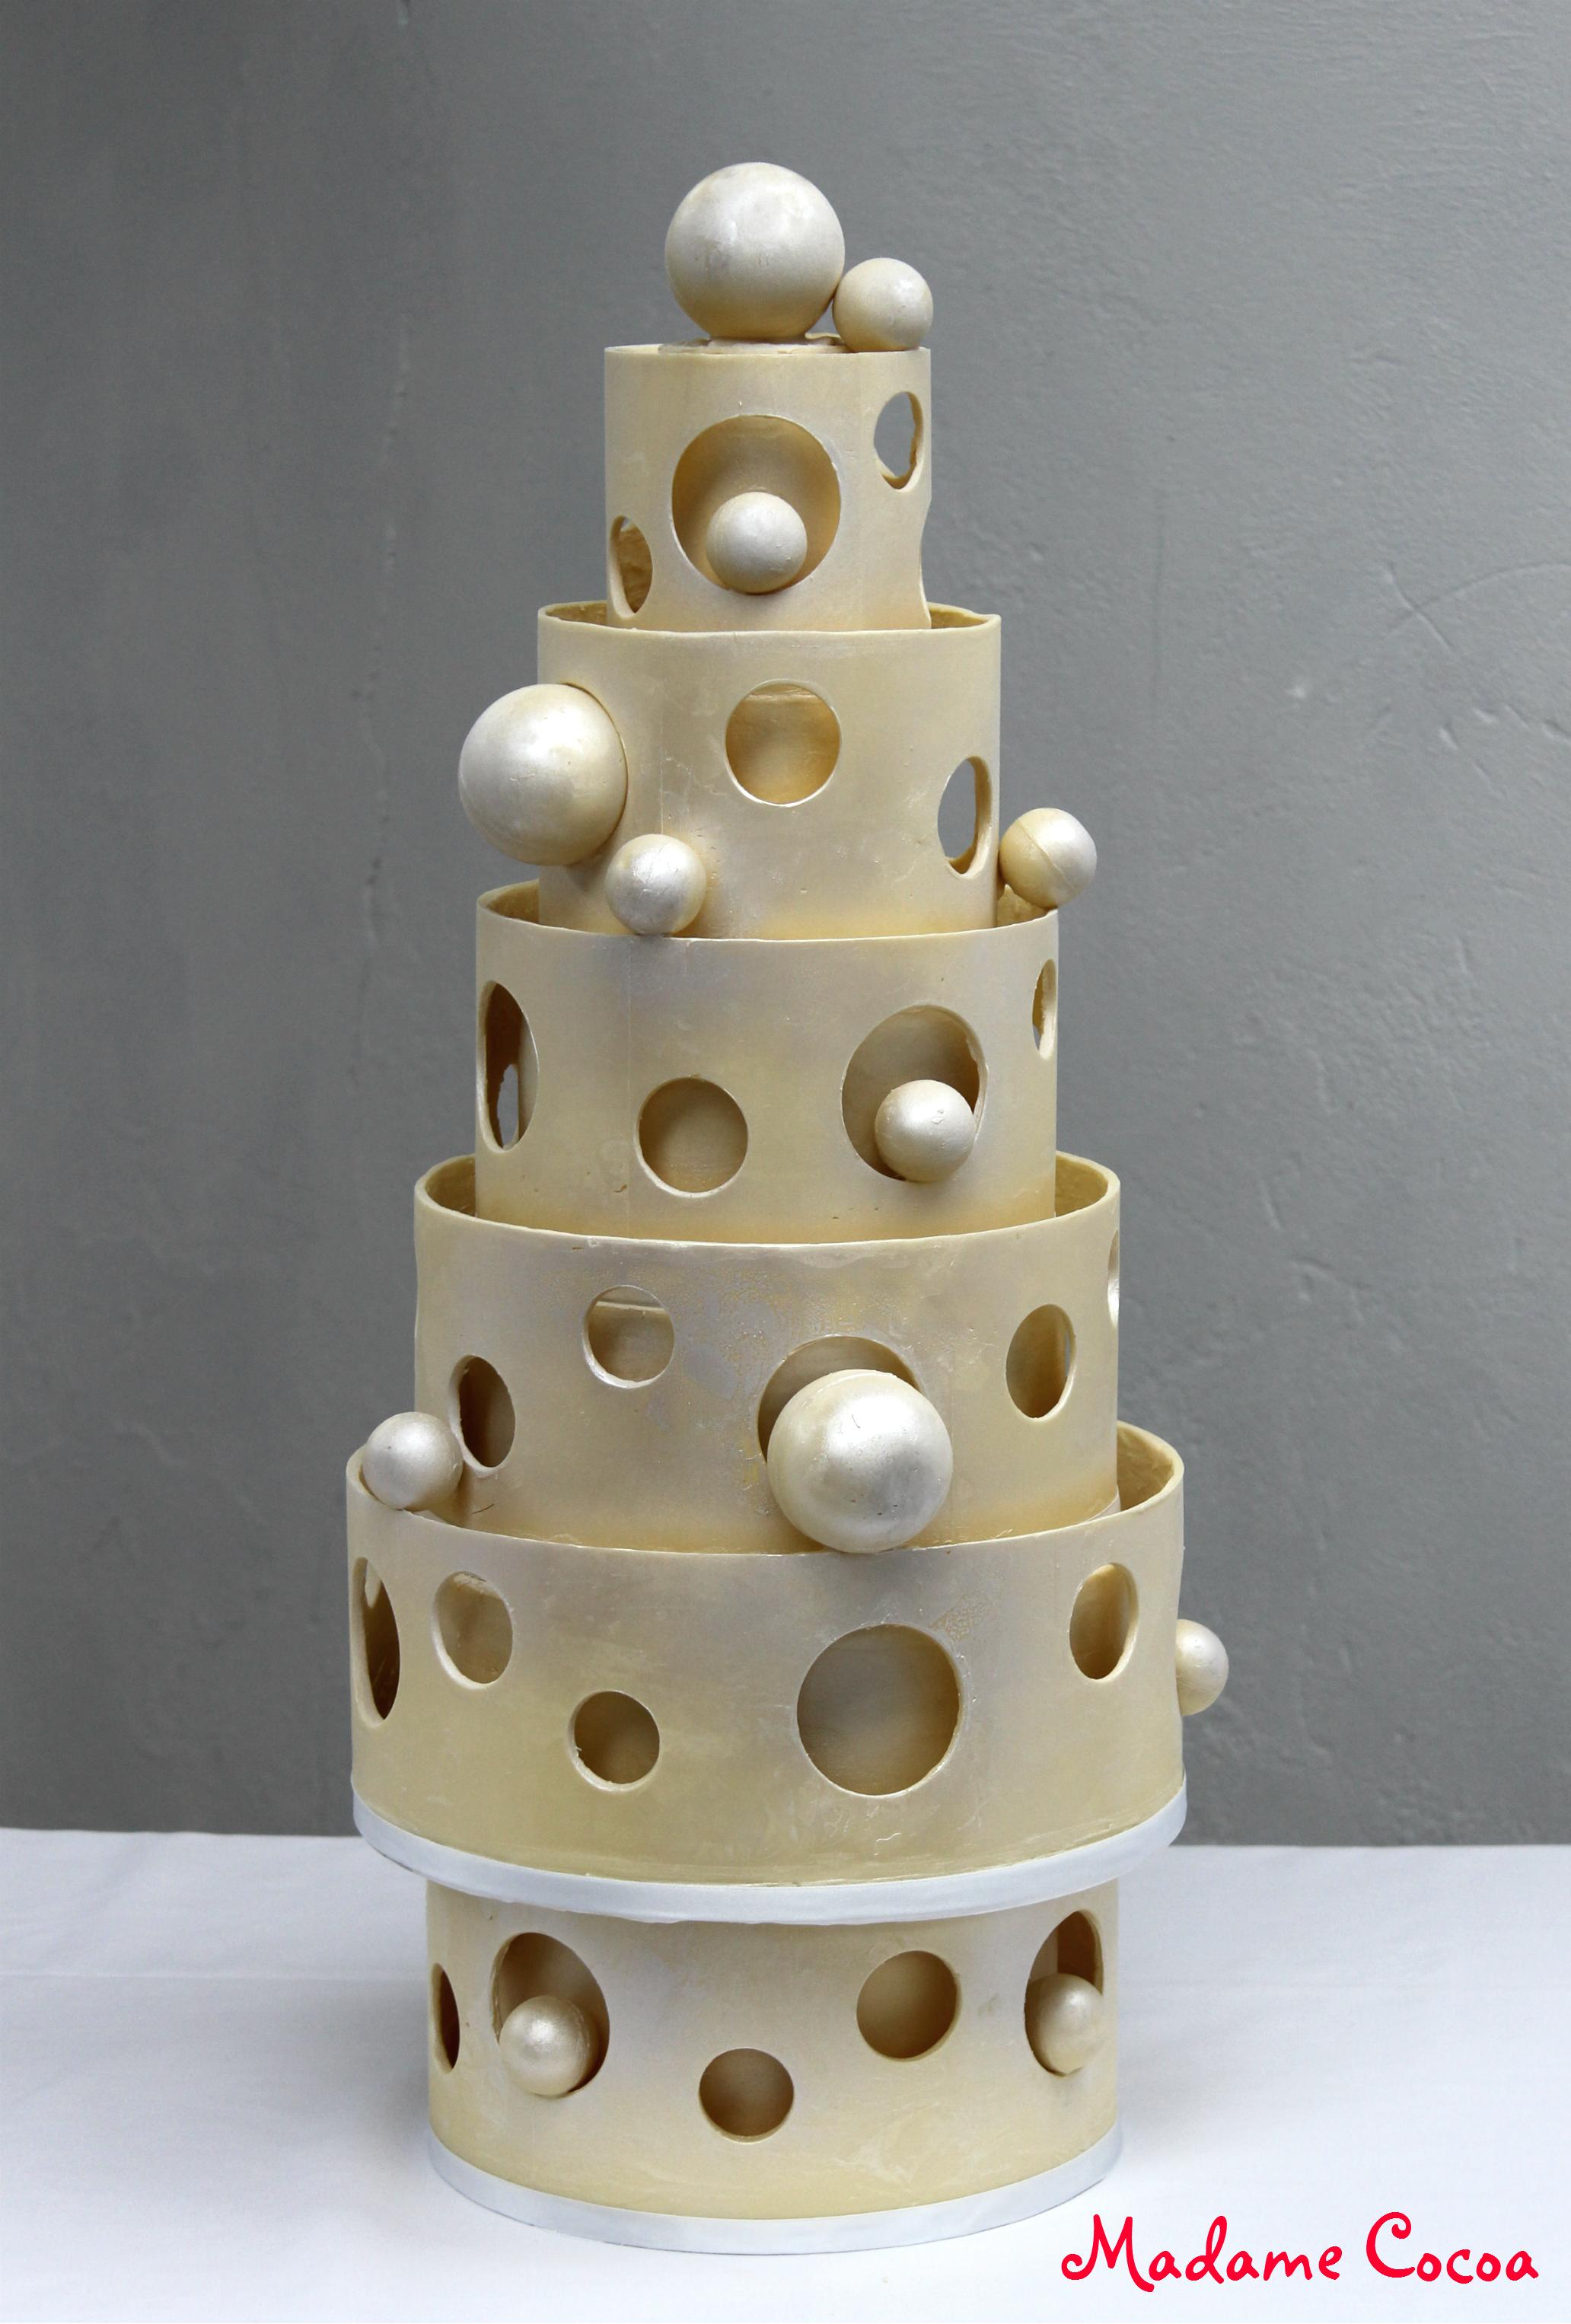 White chocolate modern wedding cake